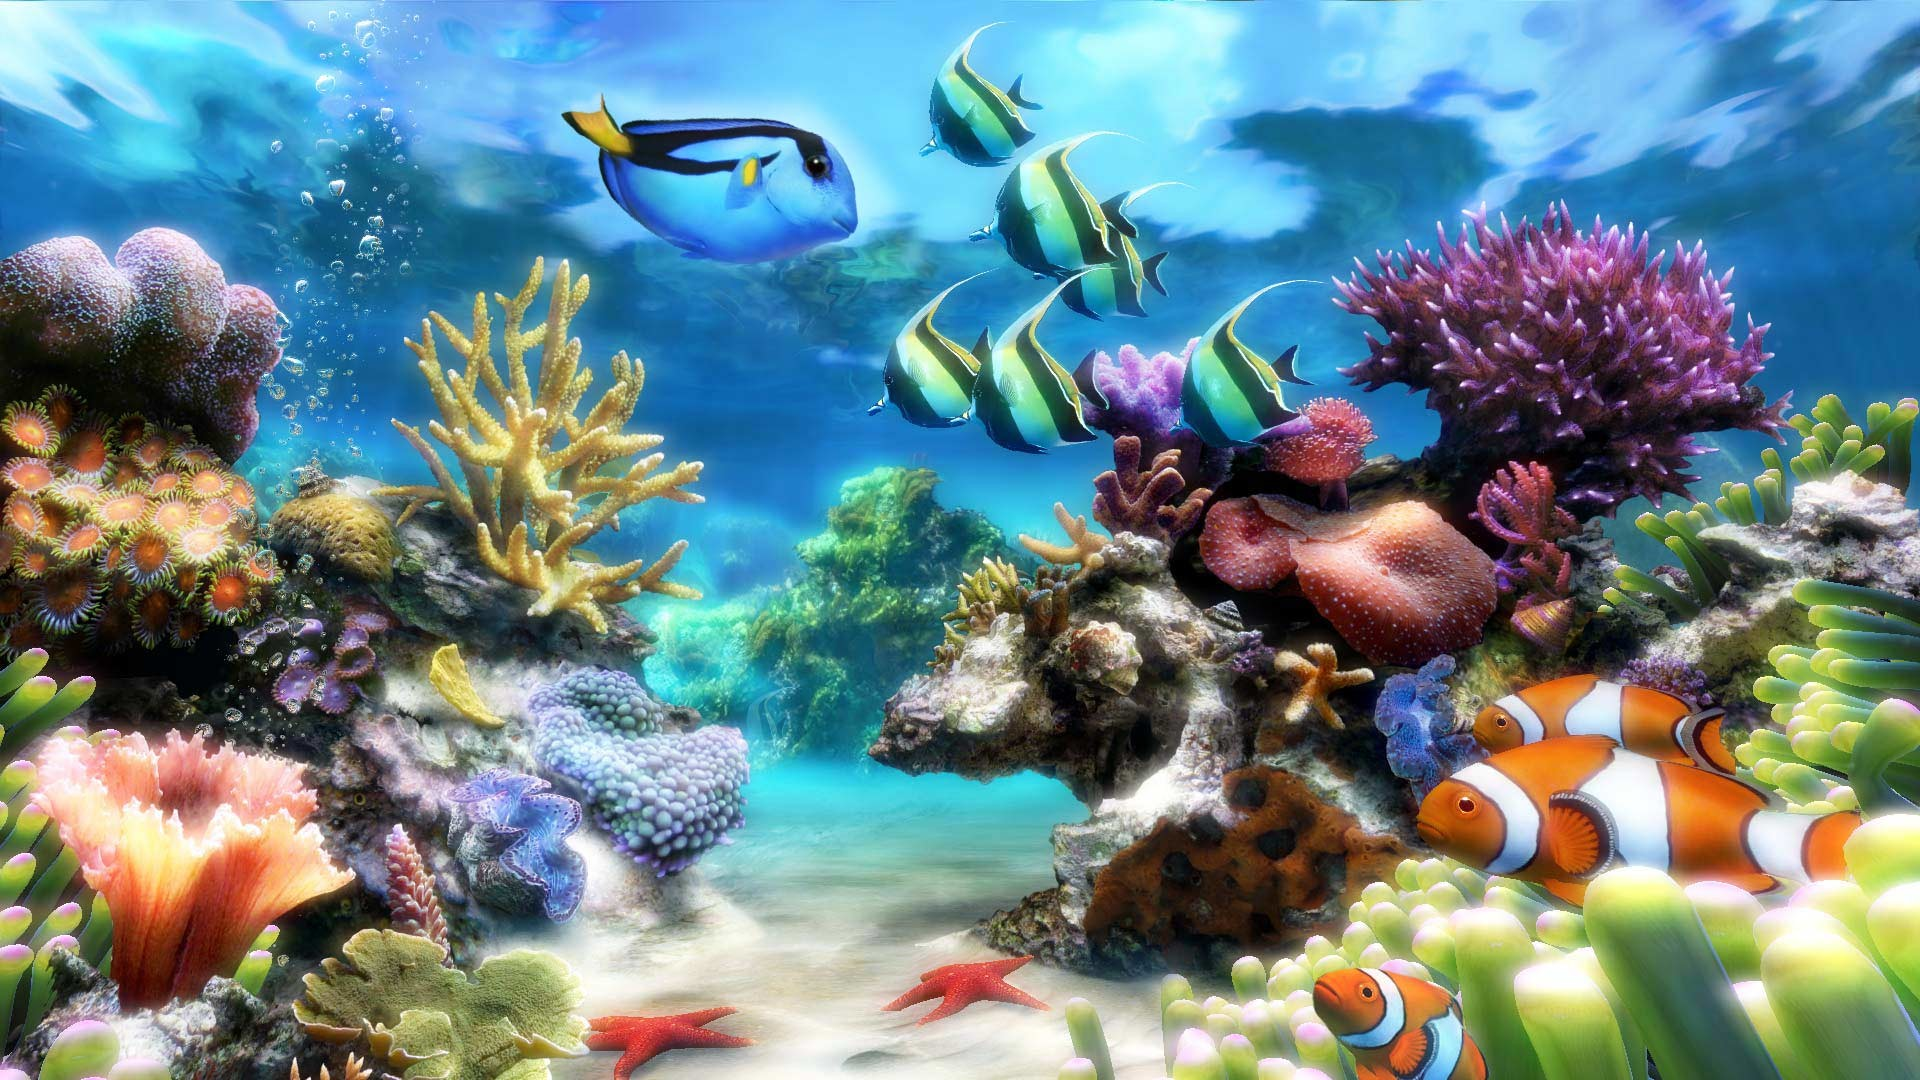 Aquarium Live Wallpaper For PC (55+ Images